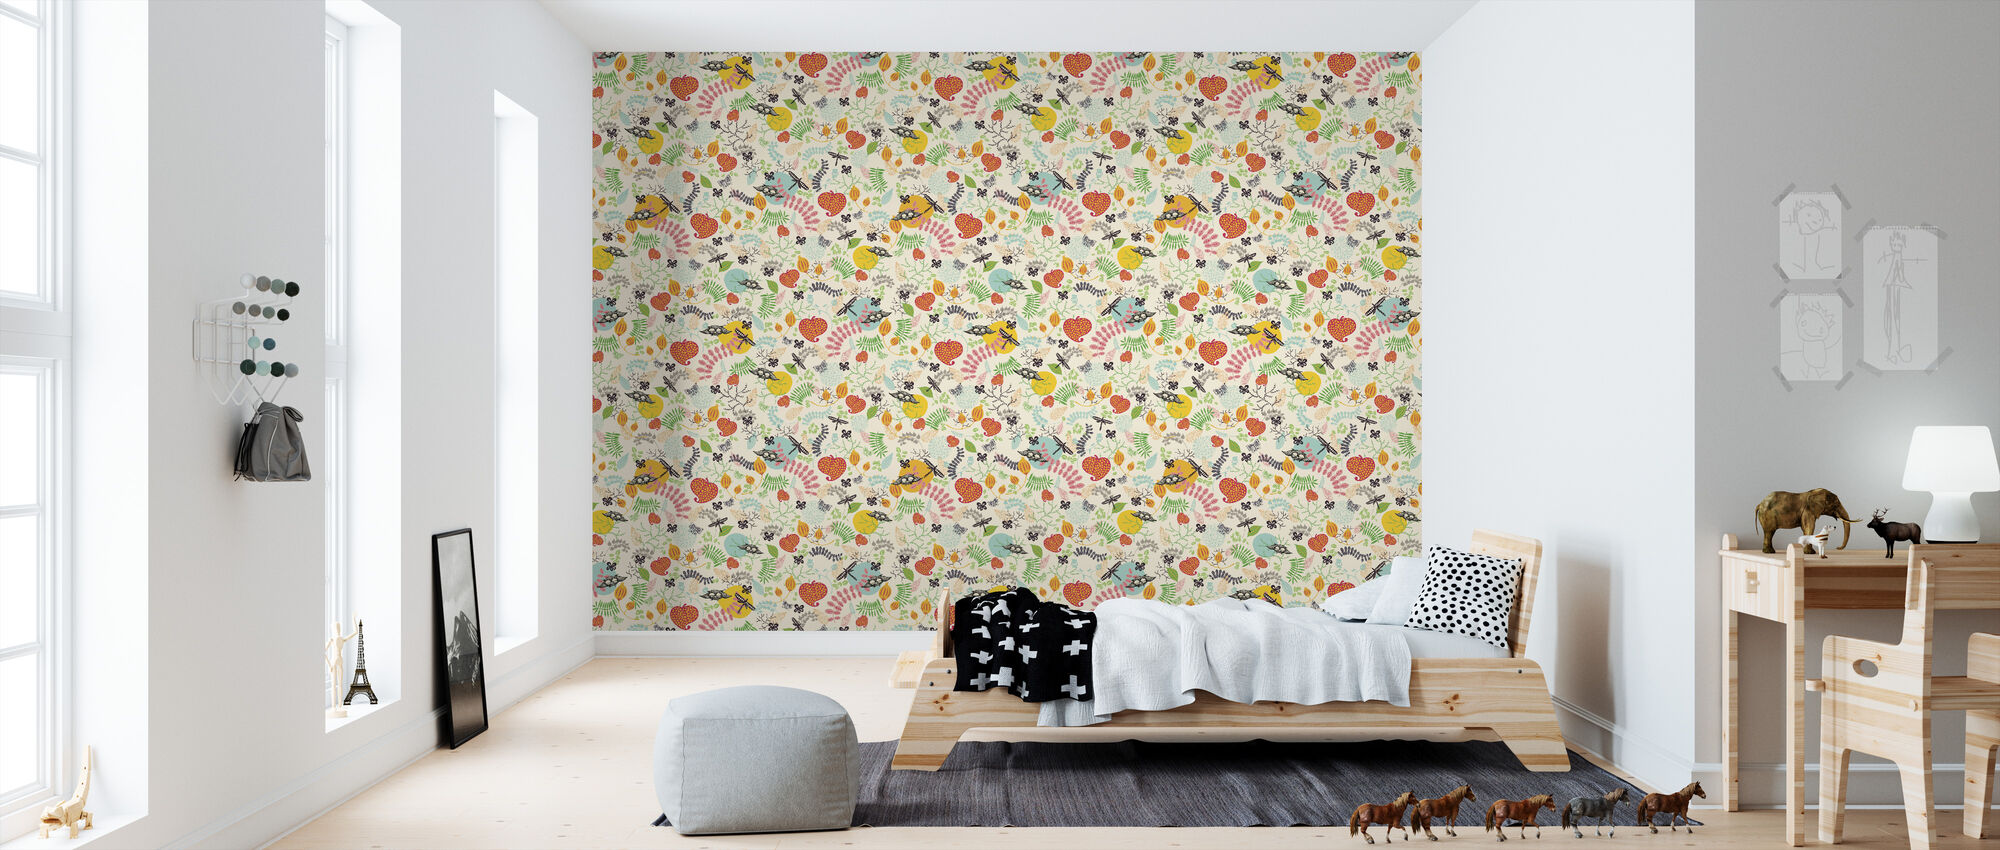 Forest Spice - Wallpaper - Kids Room